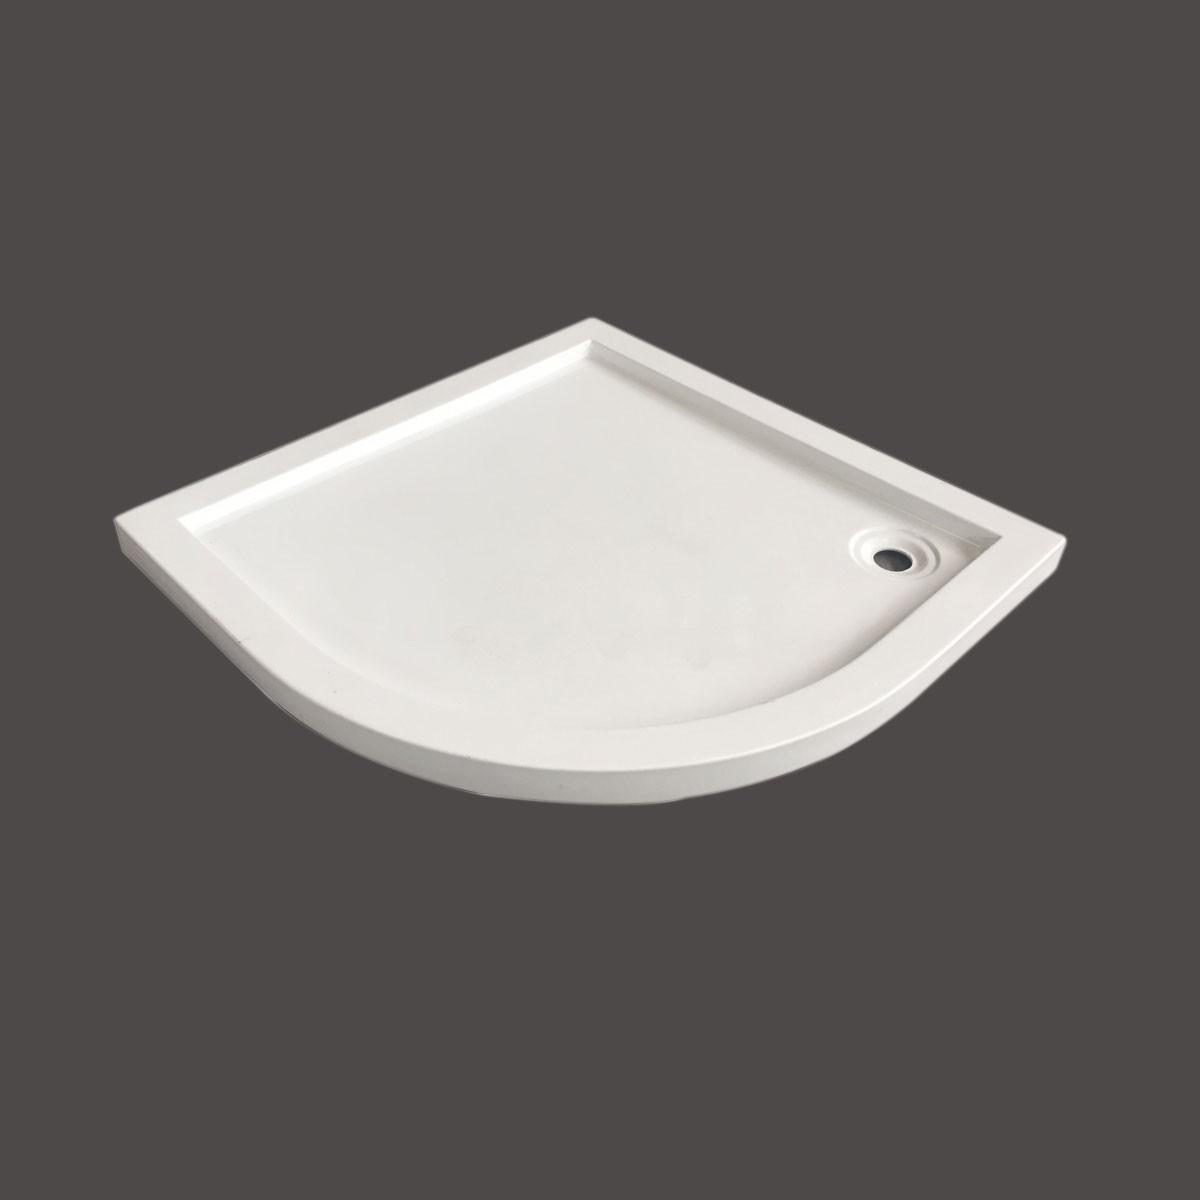 35 x 35 ln White Shower Base (DK-T112)